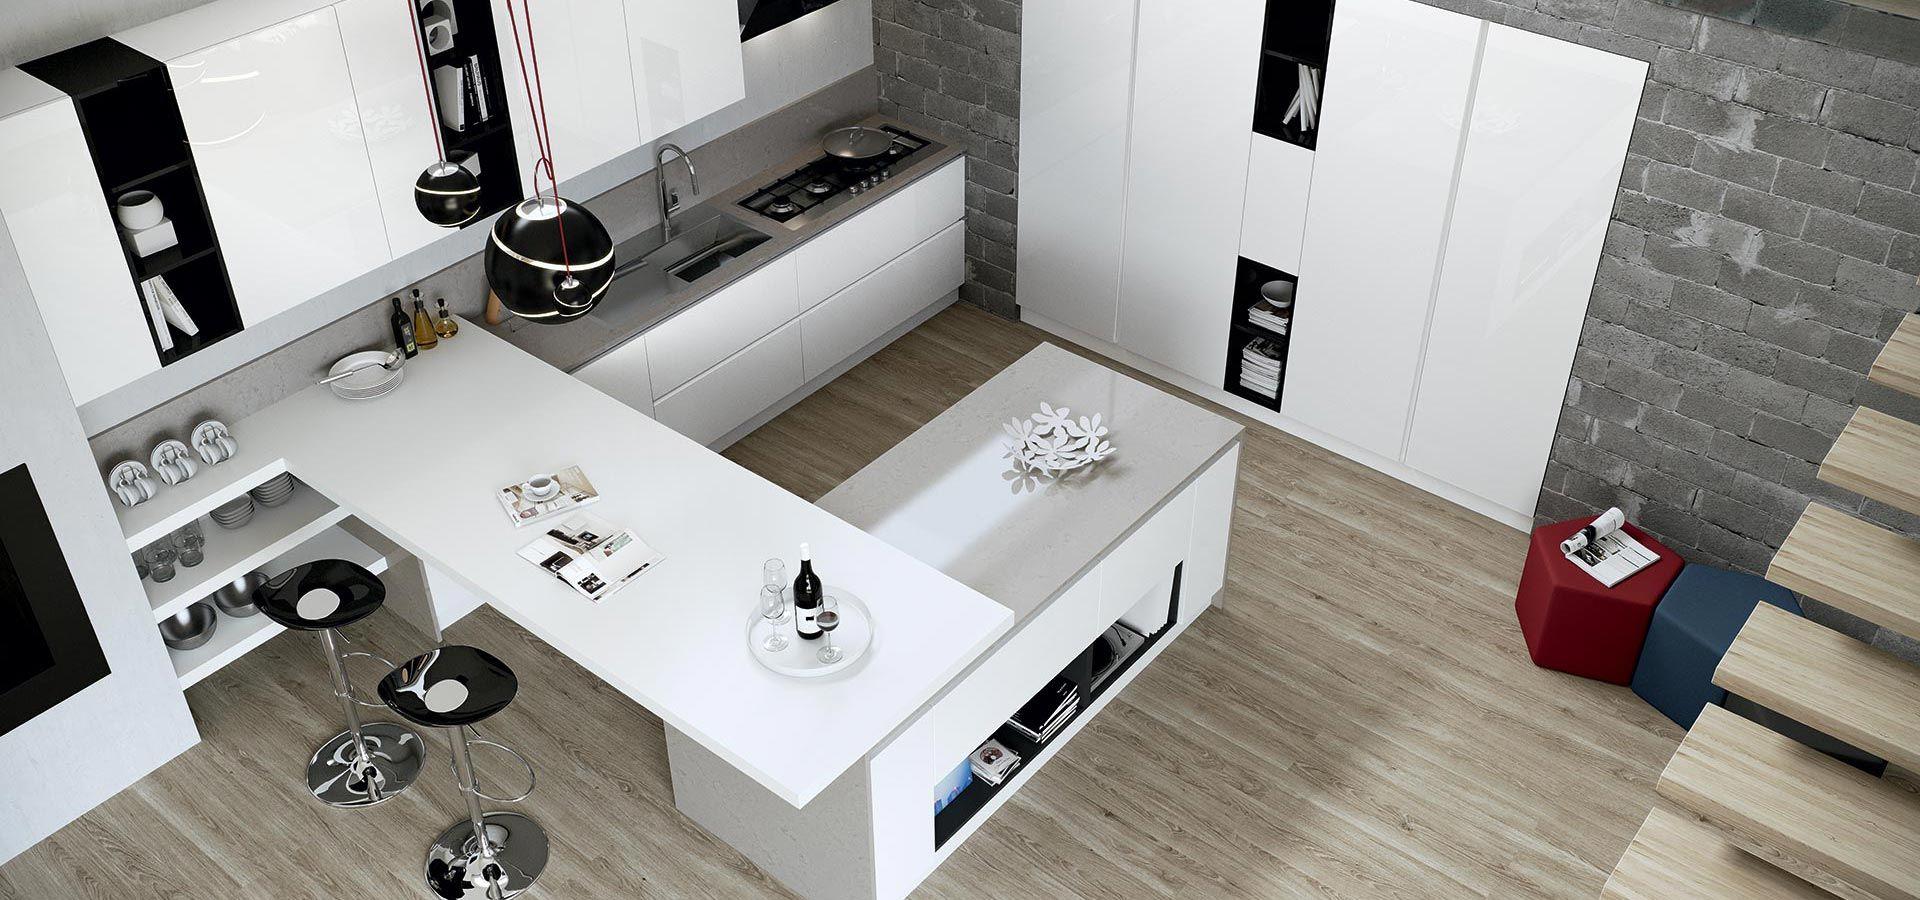 cucina moderna - round finitura bianco | vani a giorno nero ... - Okite Piano Cucina